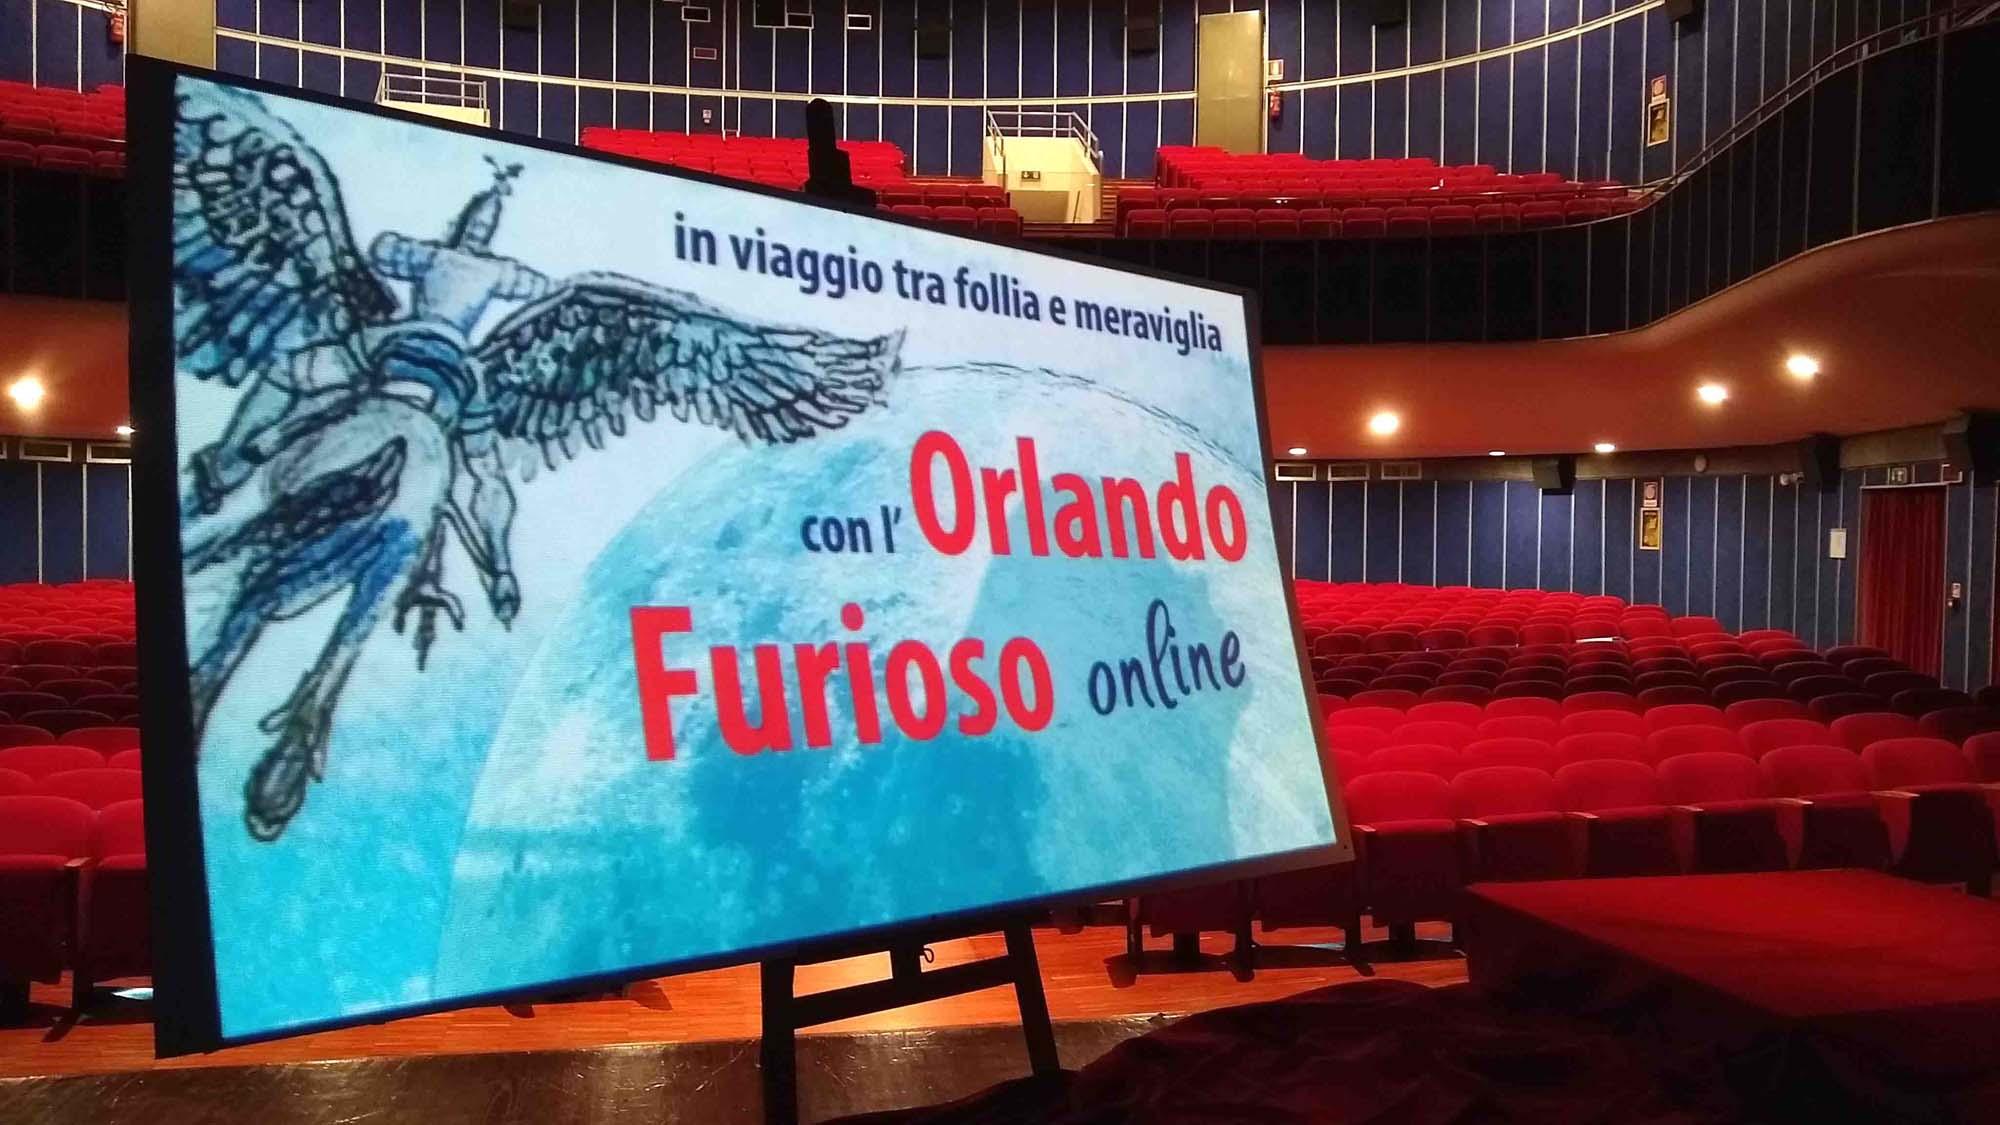 Orlando Furioso Online Letterevive